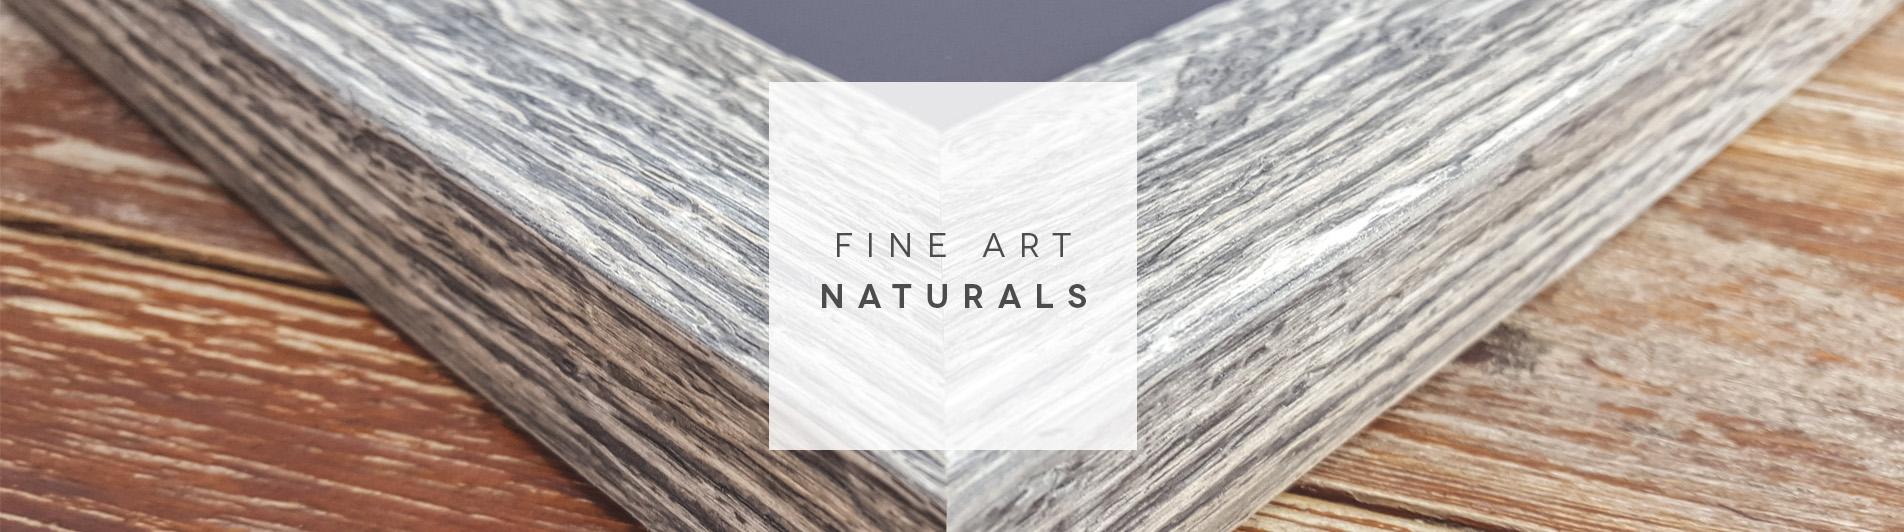 Fine Art Naturals